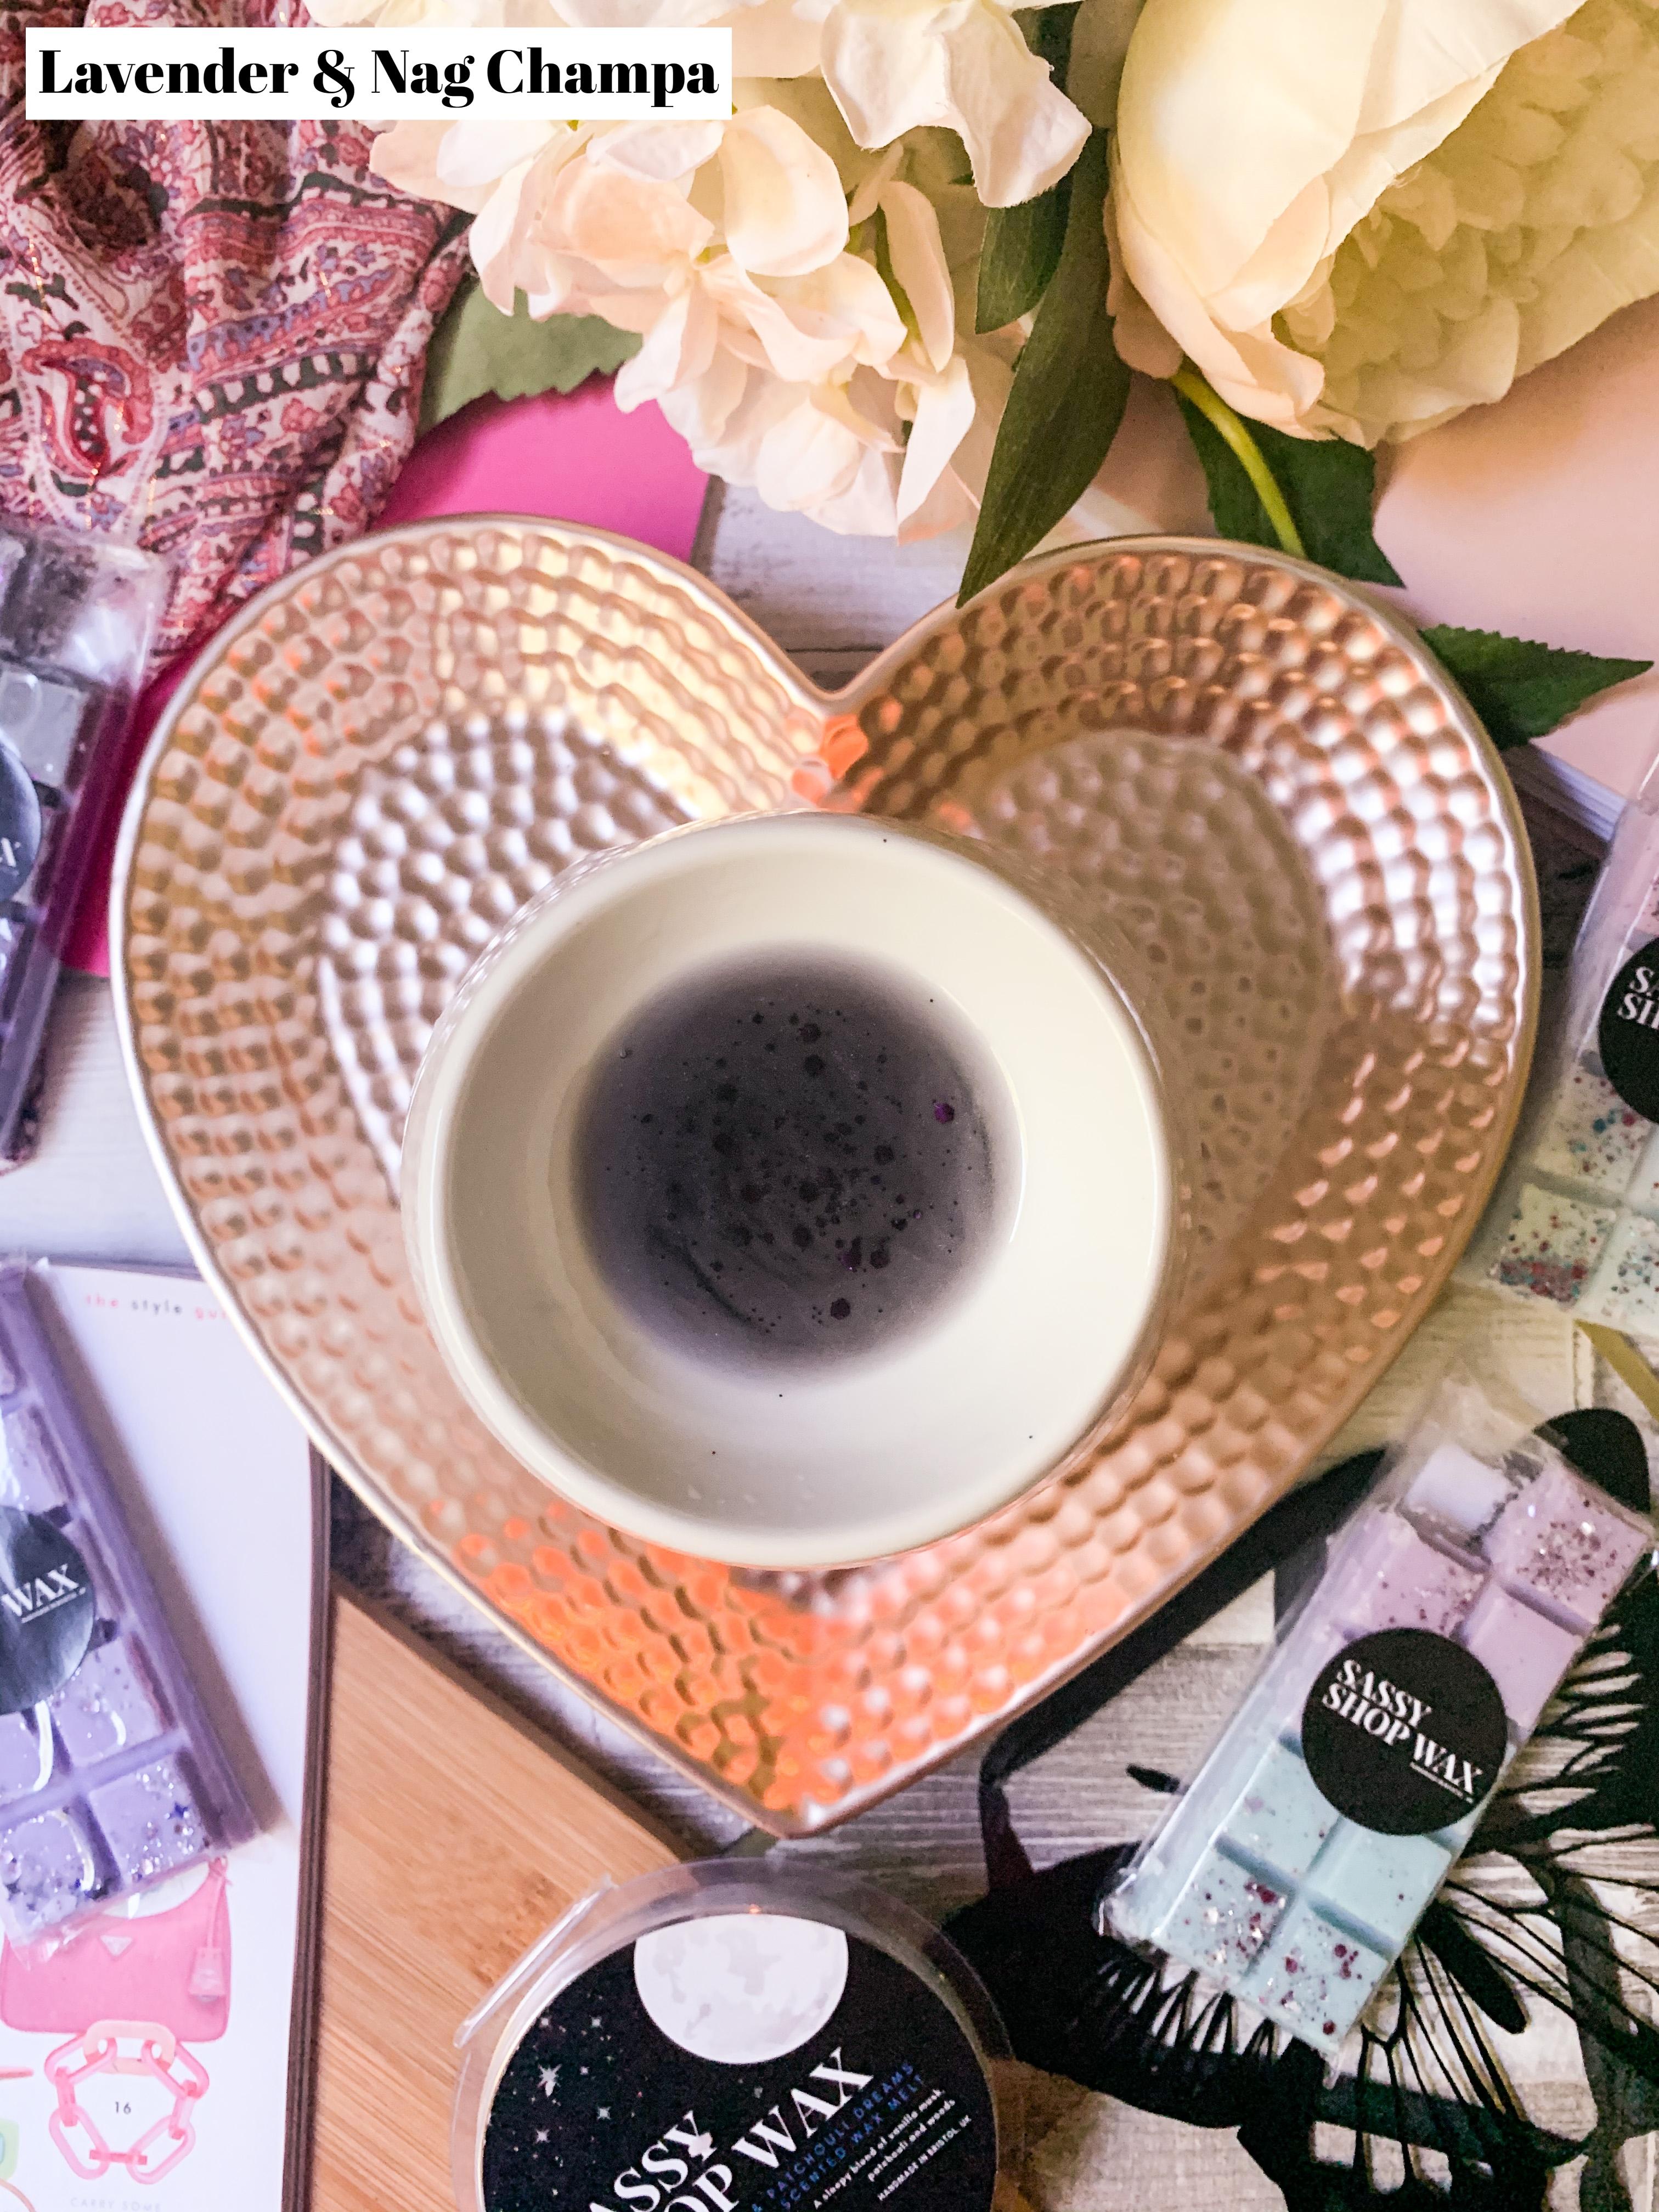 Lavender & Nag Champa Wax Melt